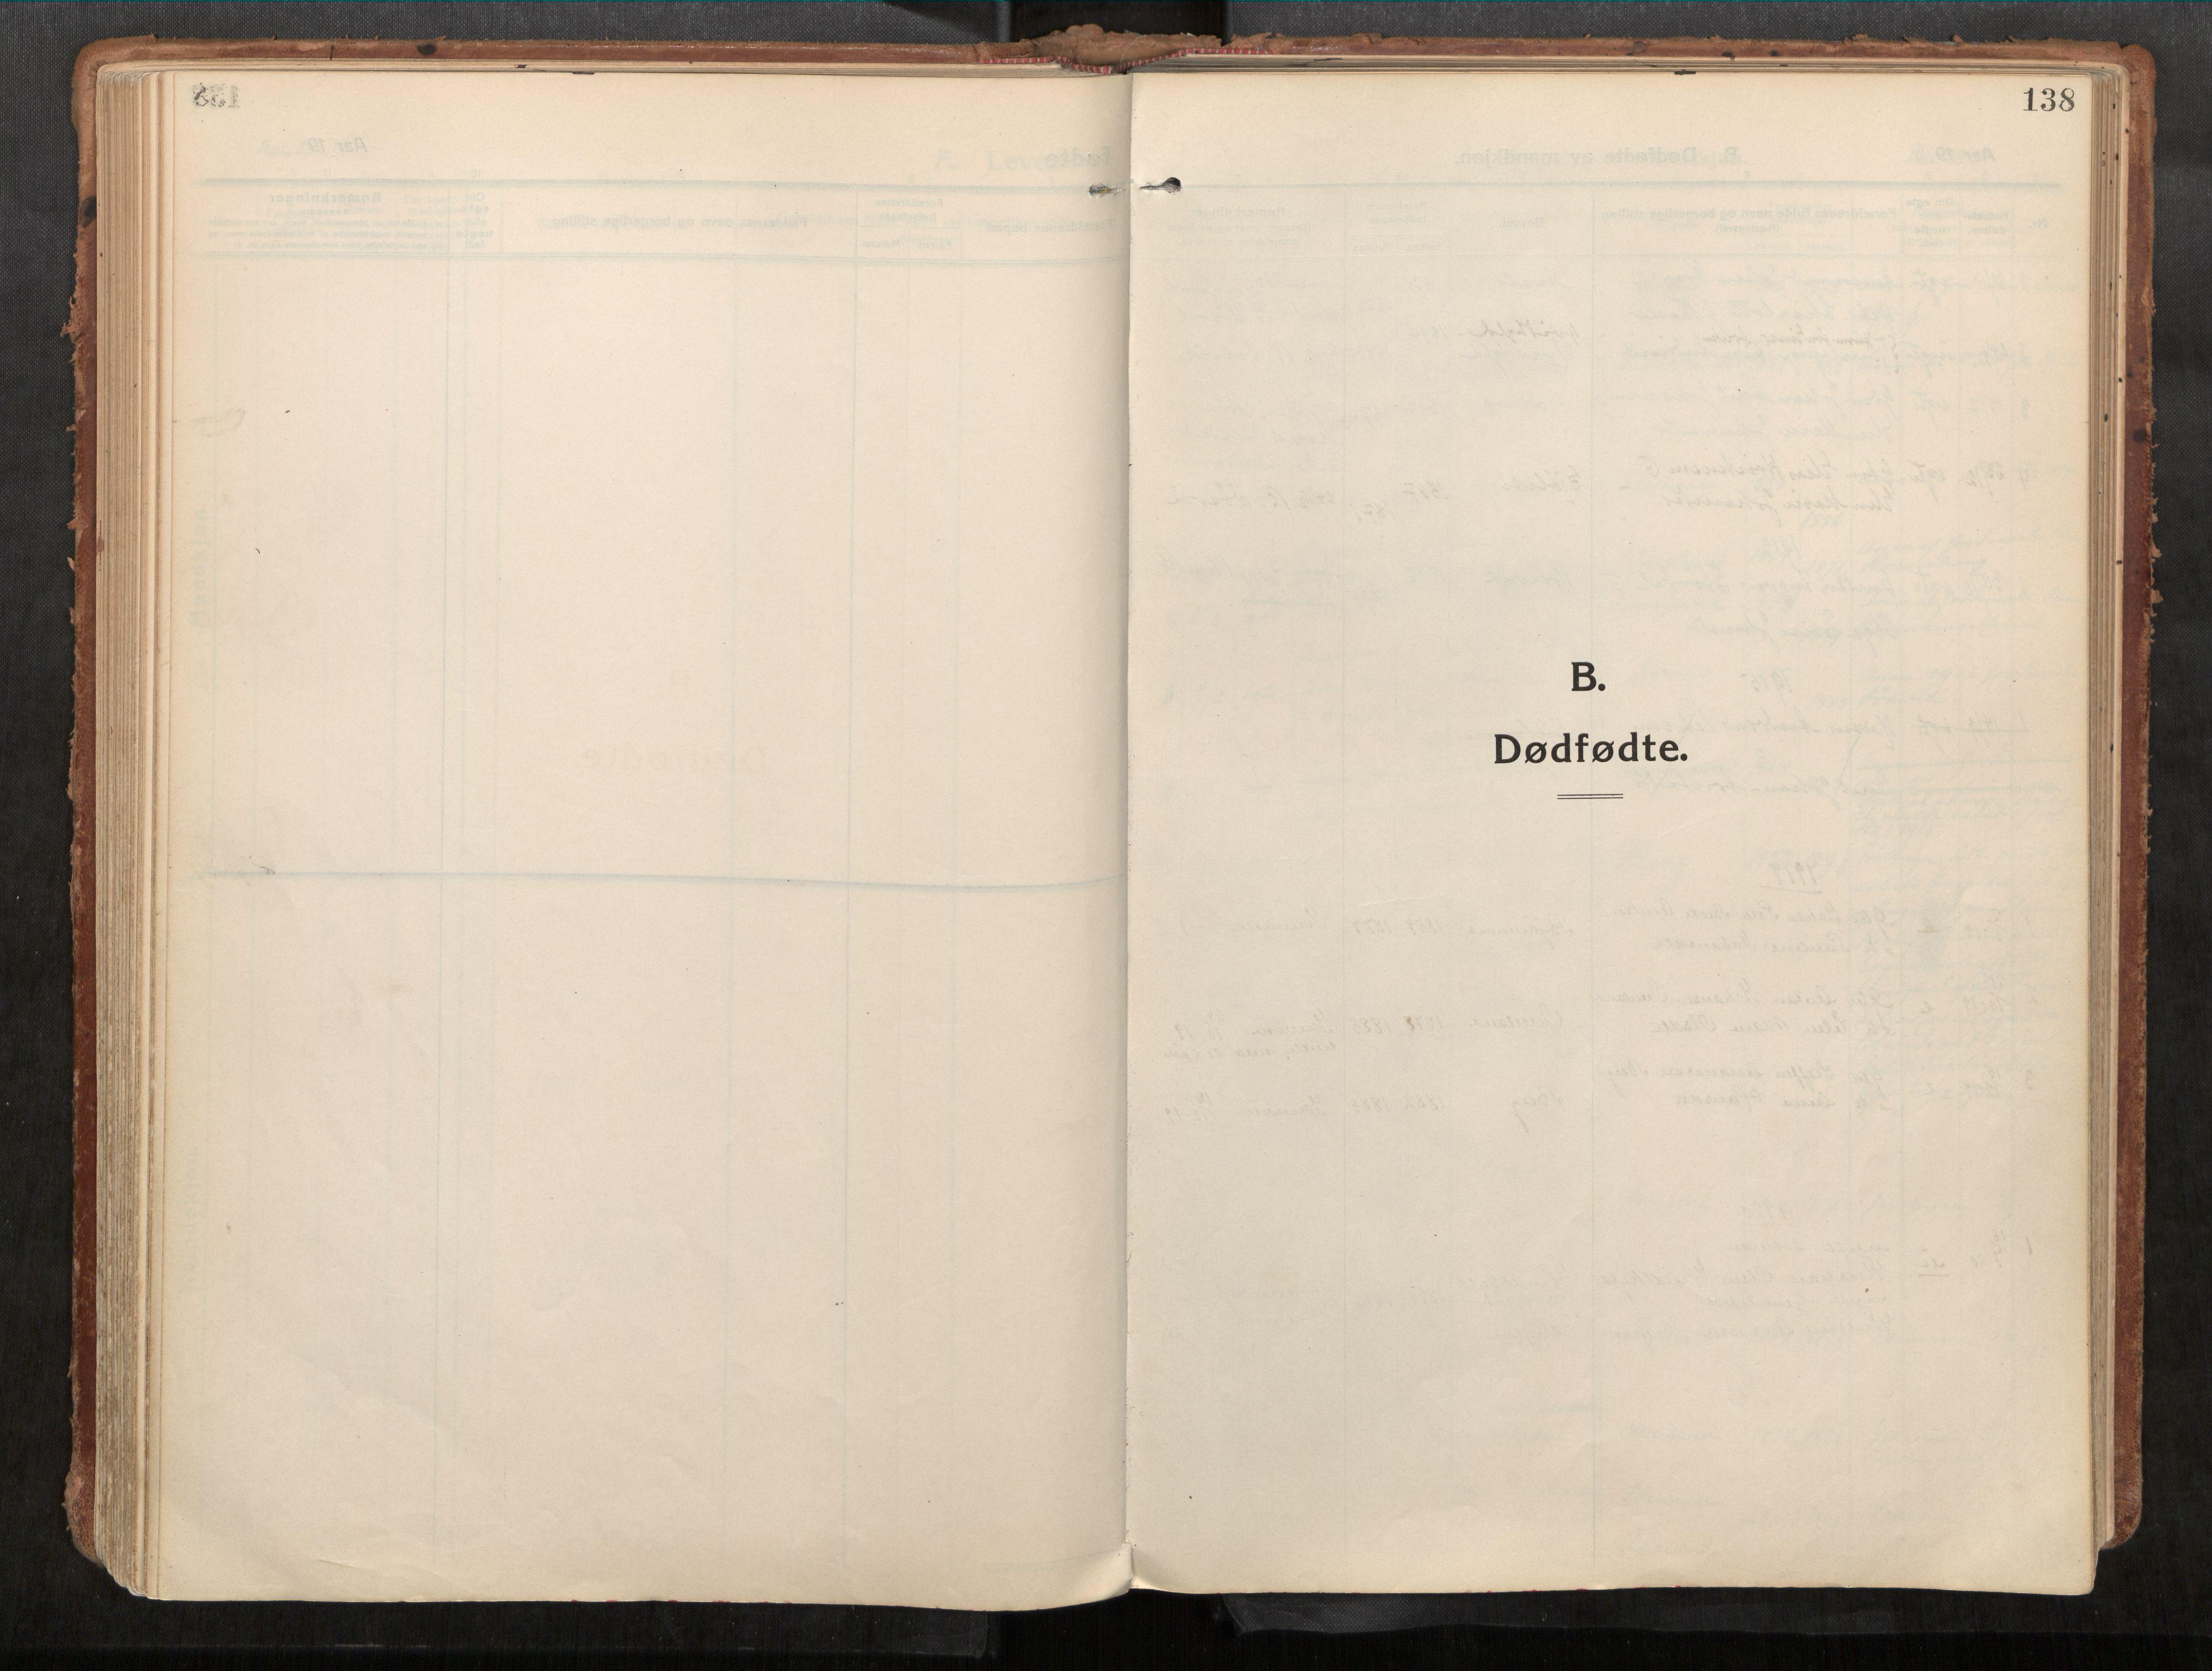 SAT, Stadsbygd sokneprestkontor, I/I1/I1a/L0001: Parish register (official) no. 1, 1911-1929, p. 138